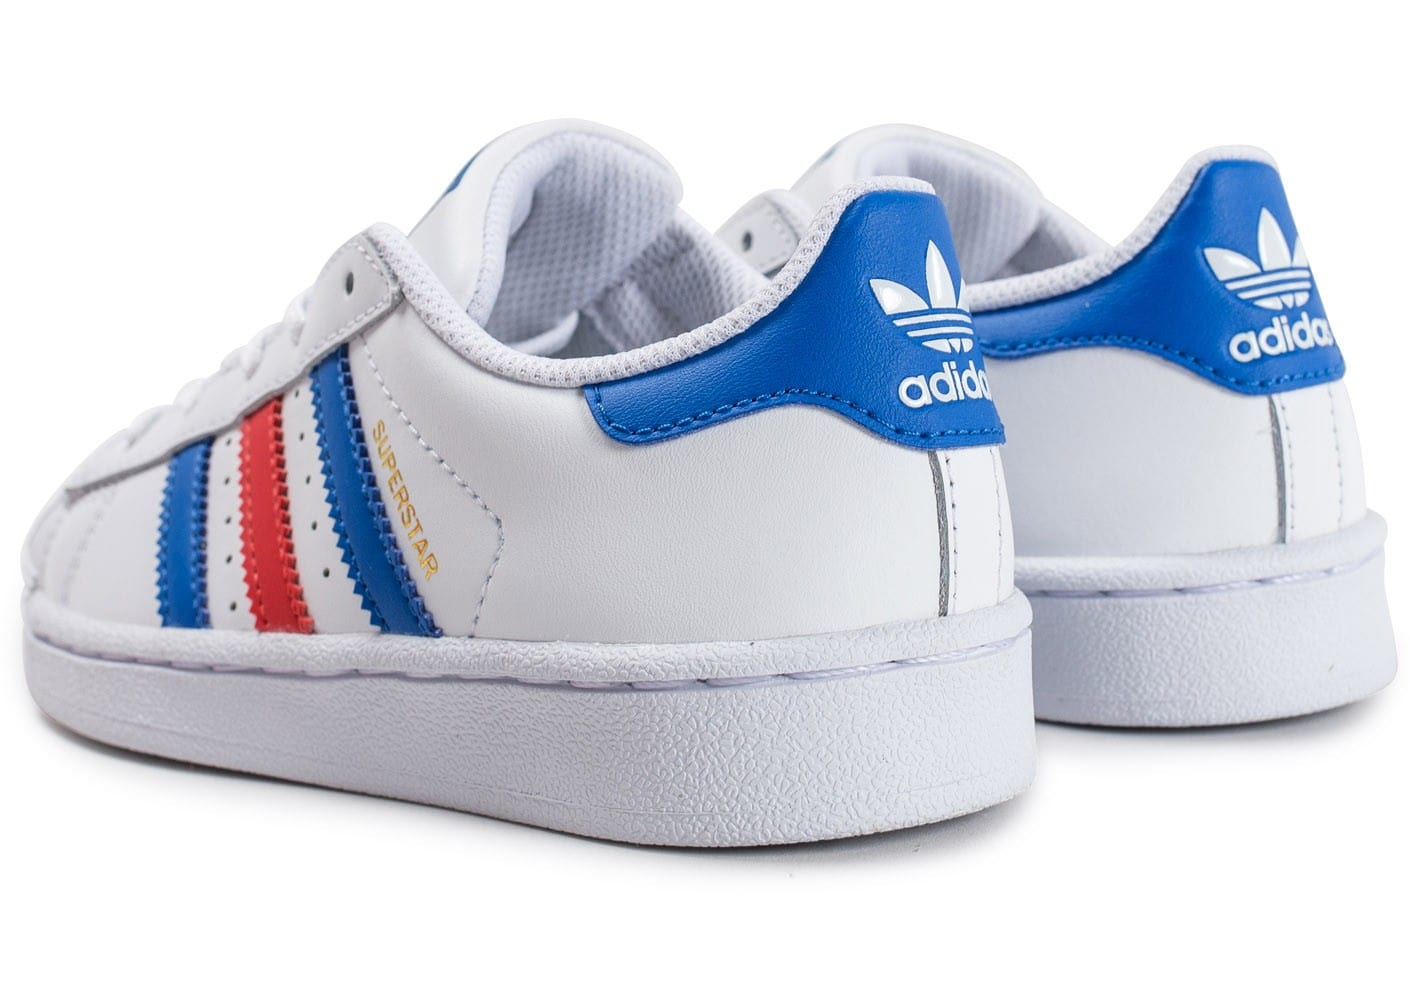 low priced 0fedc a2847 Adidas-Superstar-Baskets-Blanc-Bleu-Rouge-Hommes-S- Adidas Superstar bleu  Chaussures adidas originals zestra w sneakers noir femme,adidas superstar 37  2 3 ...